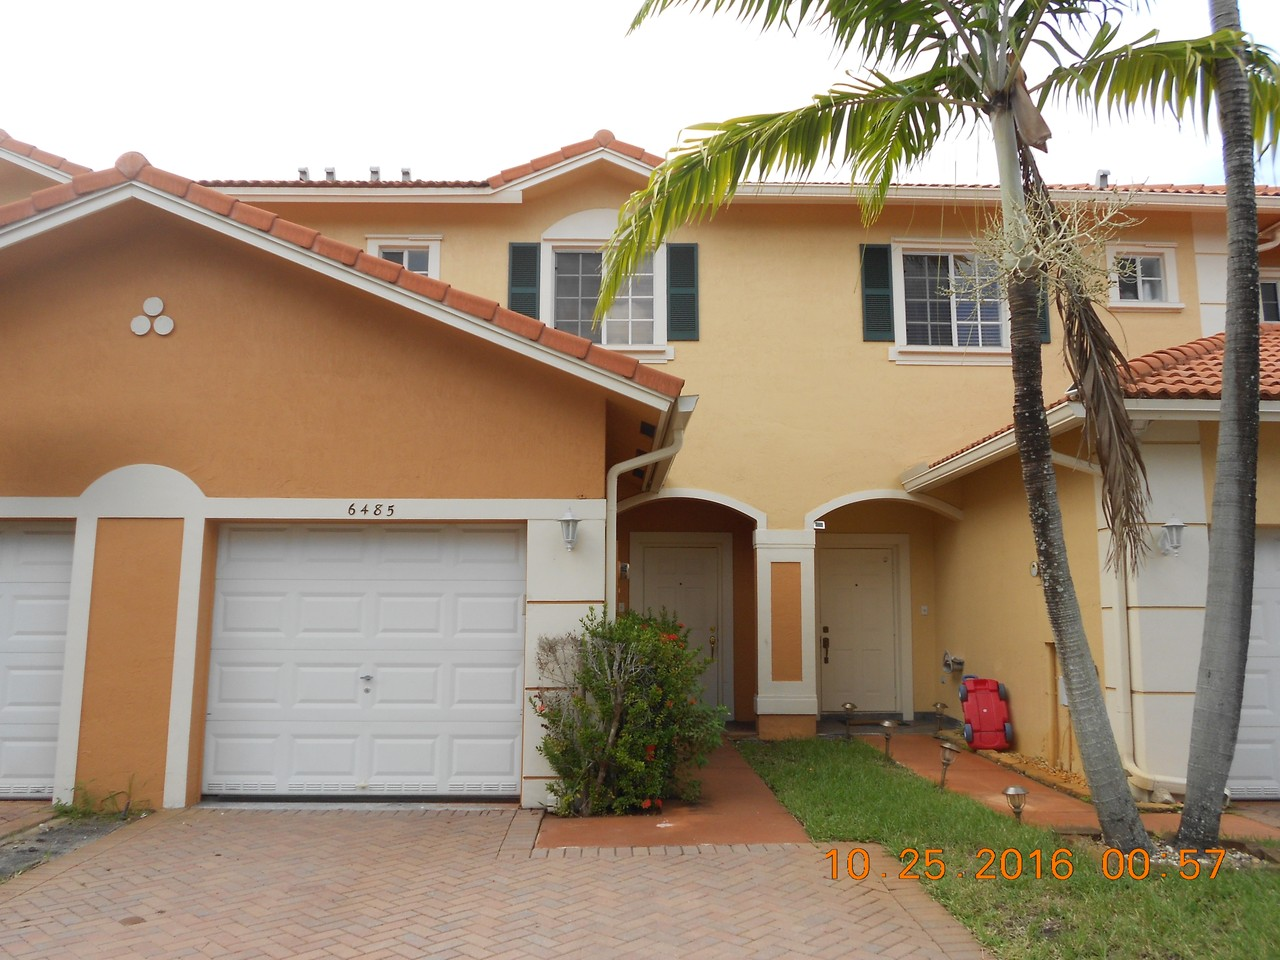 6485 Catalina Ln, Pompano Beach, FL 33321 3 Bedroom House for Rent ...